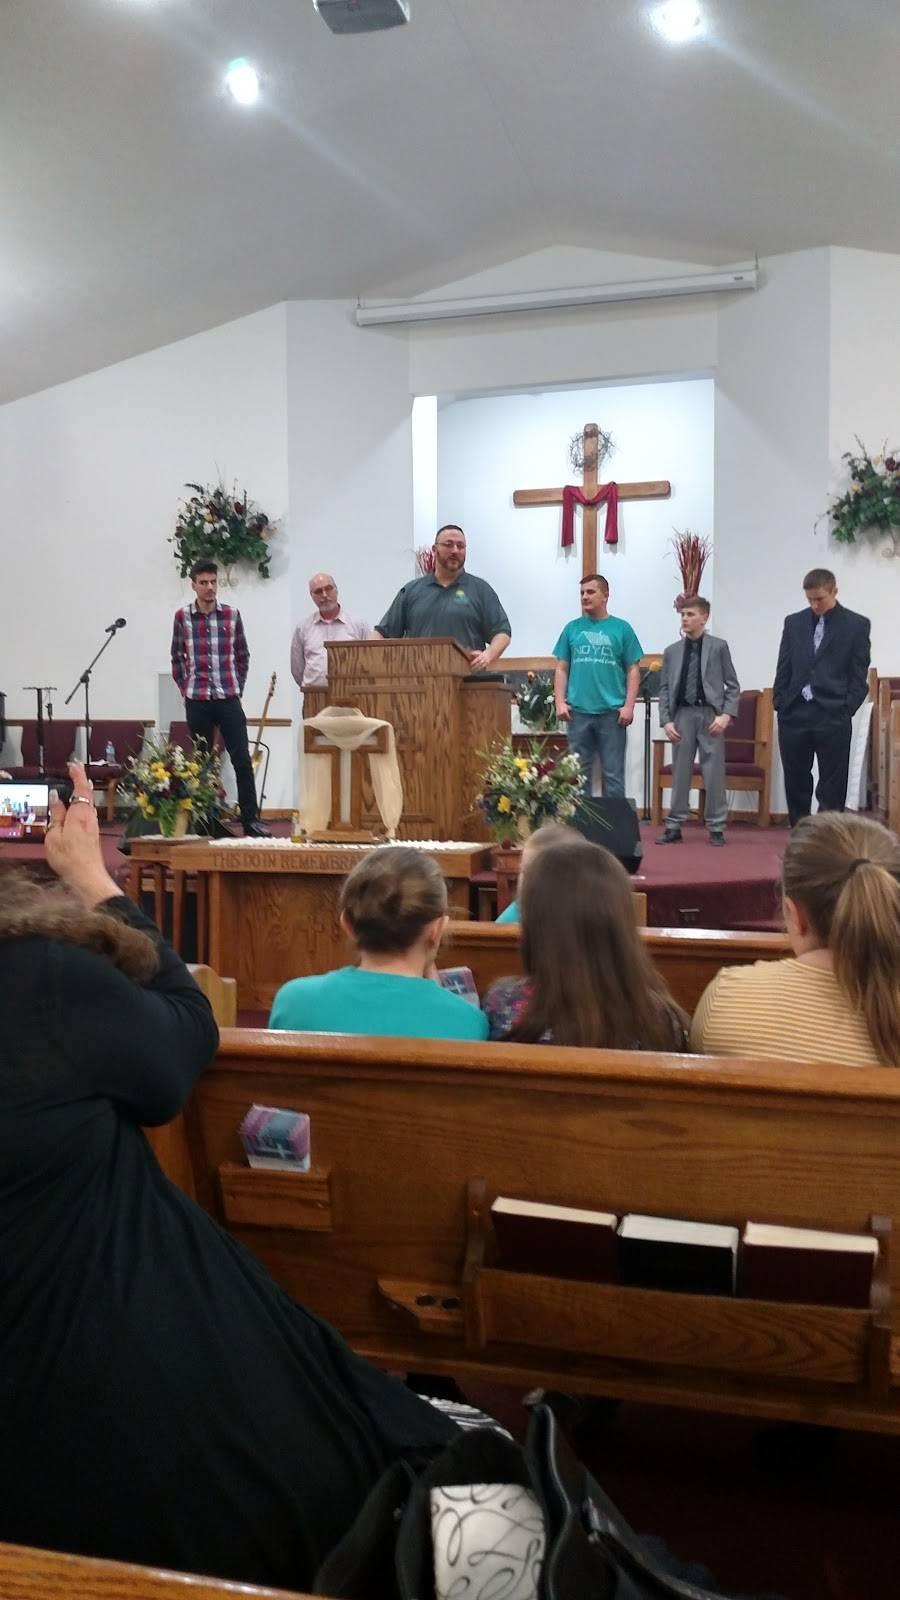 Southwest Freewill Baptist Church - church  | Photo 1 of 2 | Address: 1542 Greenleaf Rd, Columbus, OH 43223, USA | Phone: (614) 276-3861